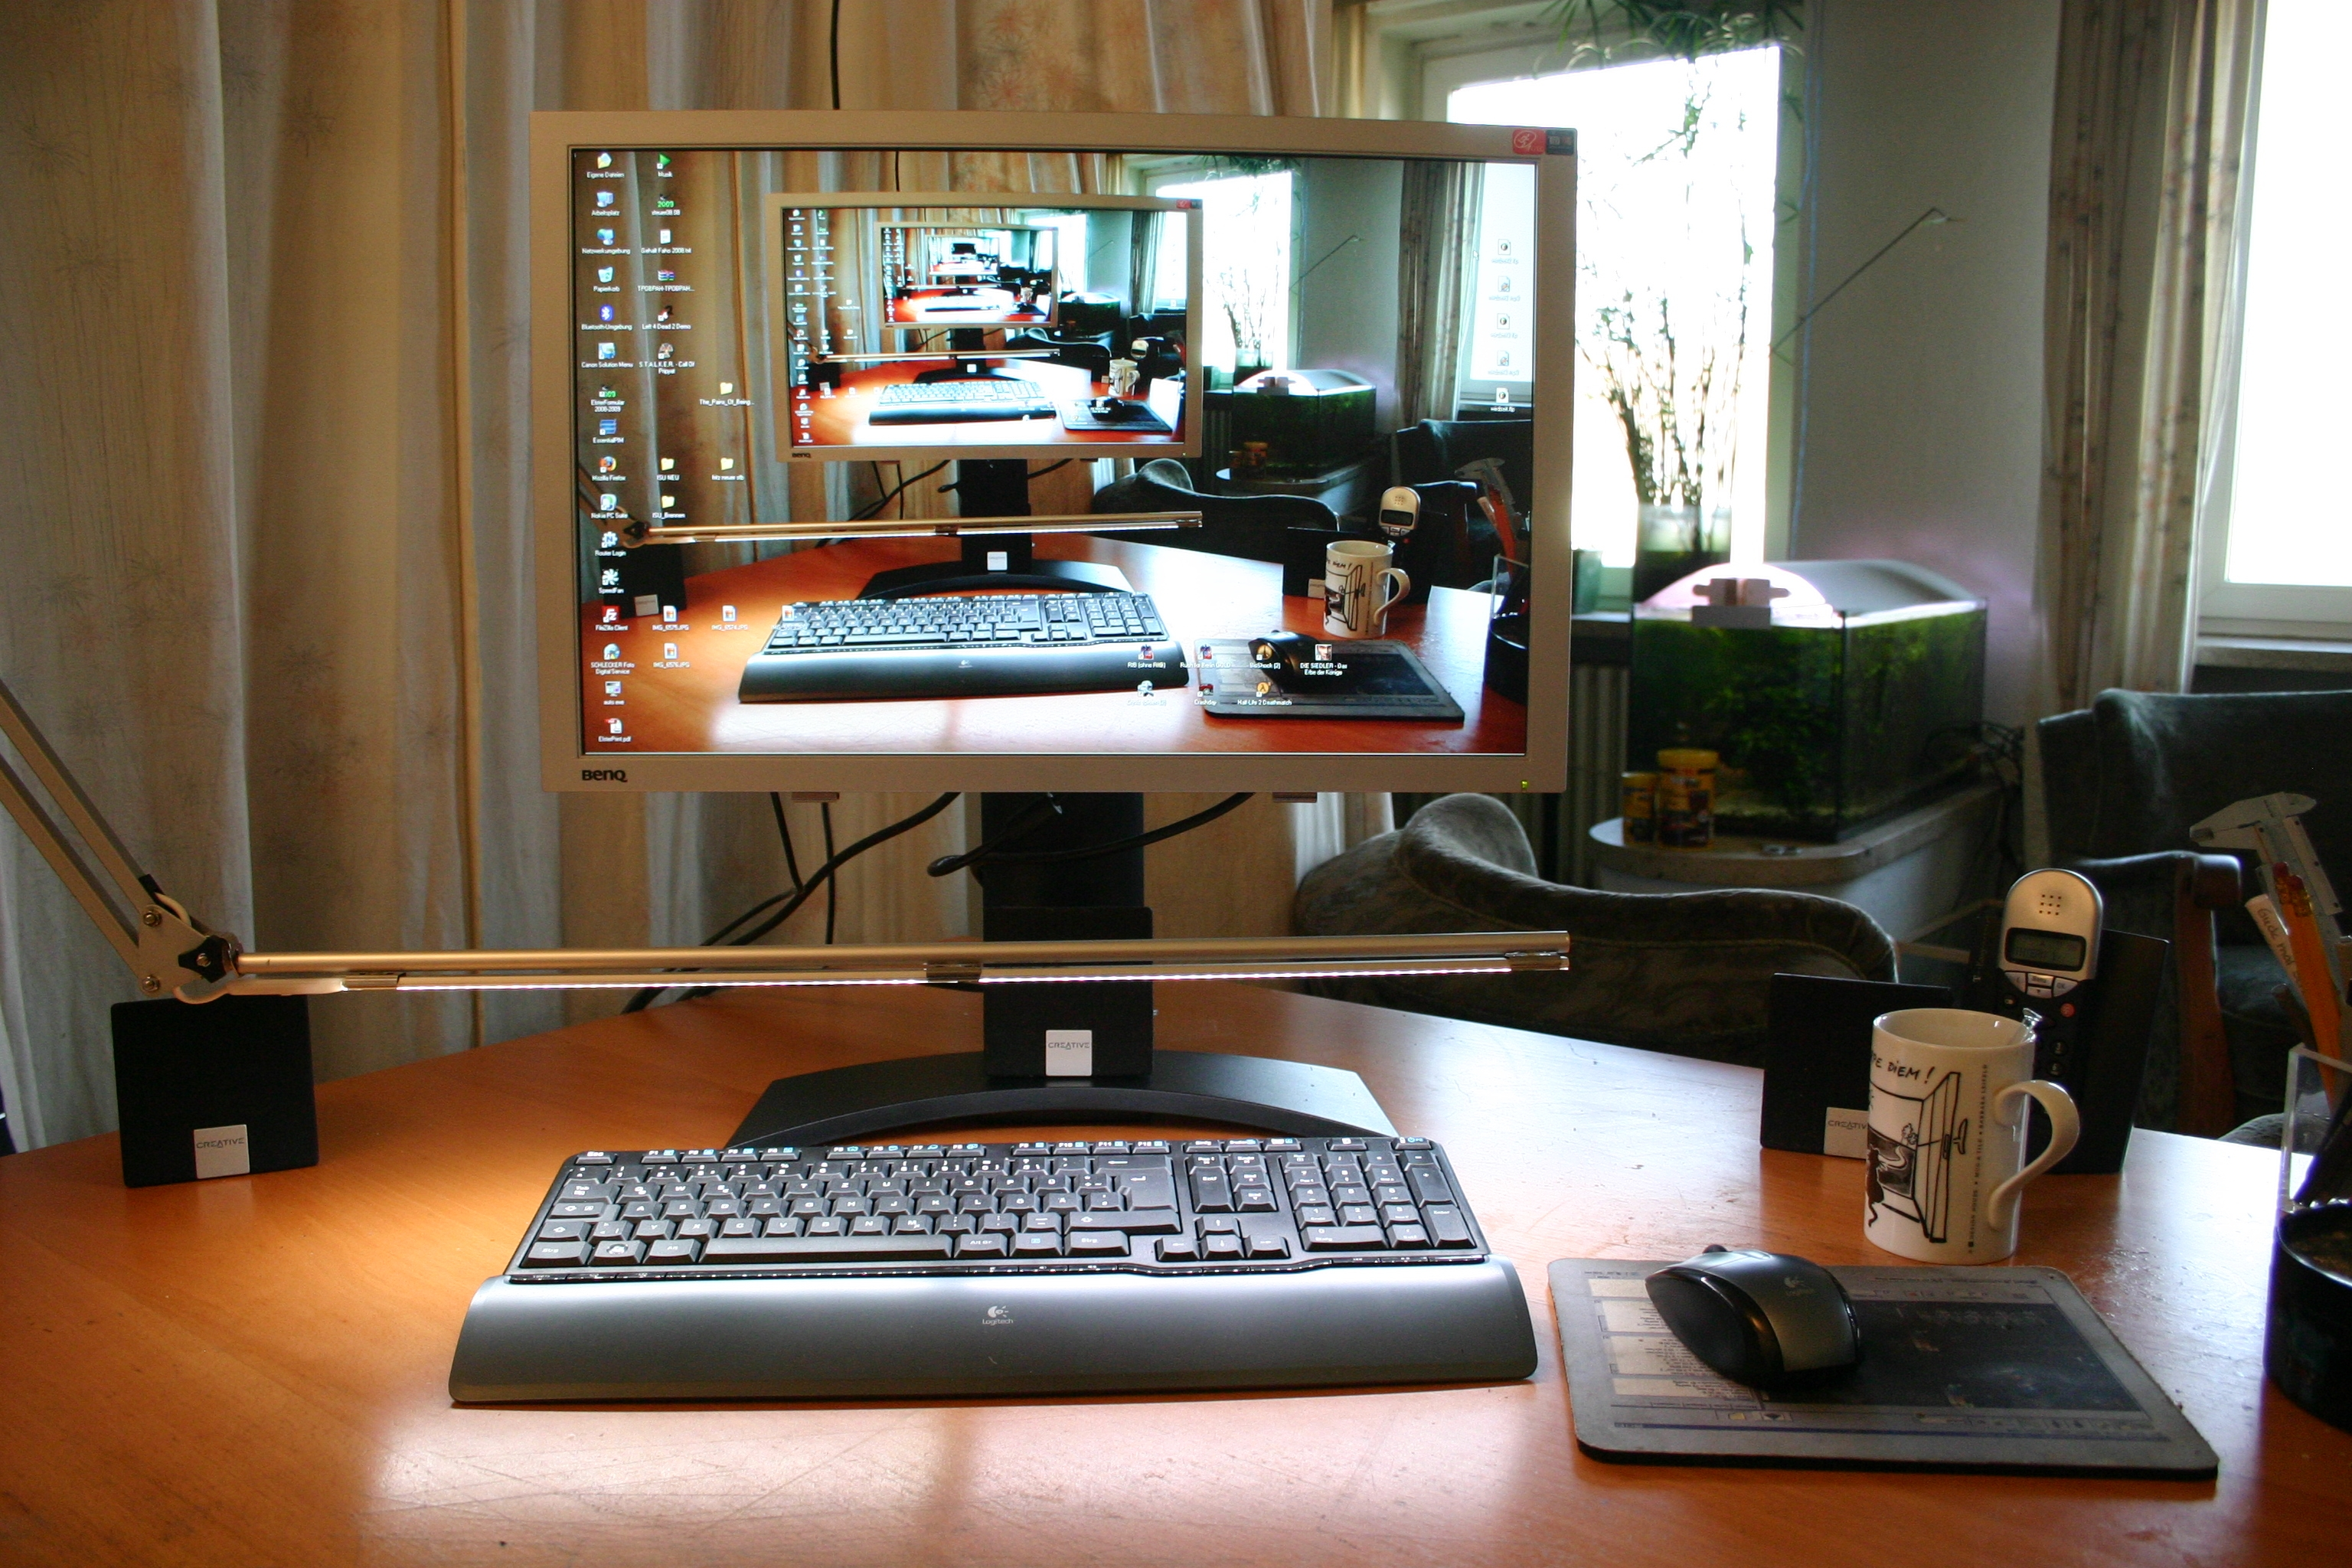 Picture of LED-desktop / Workspace / Keyboard Lamp (IKEA Tertial Hack)